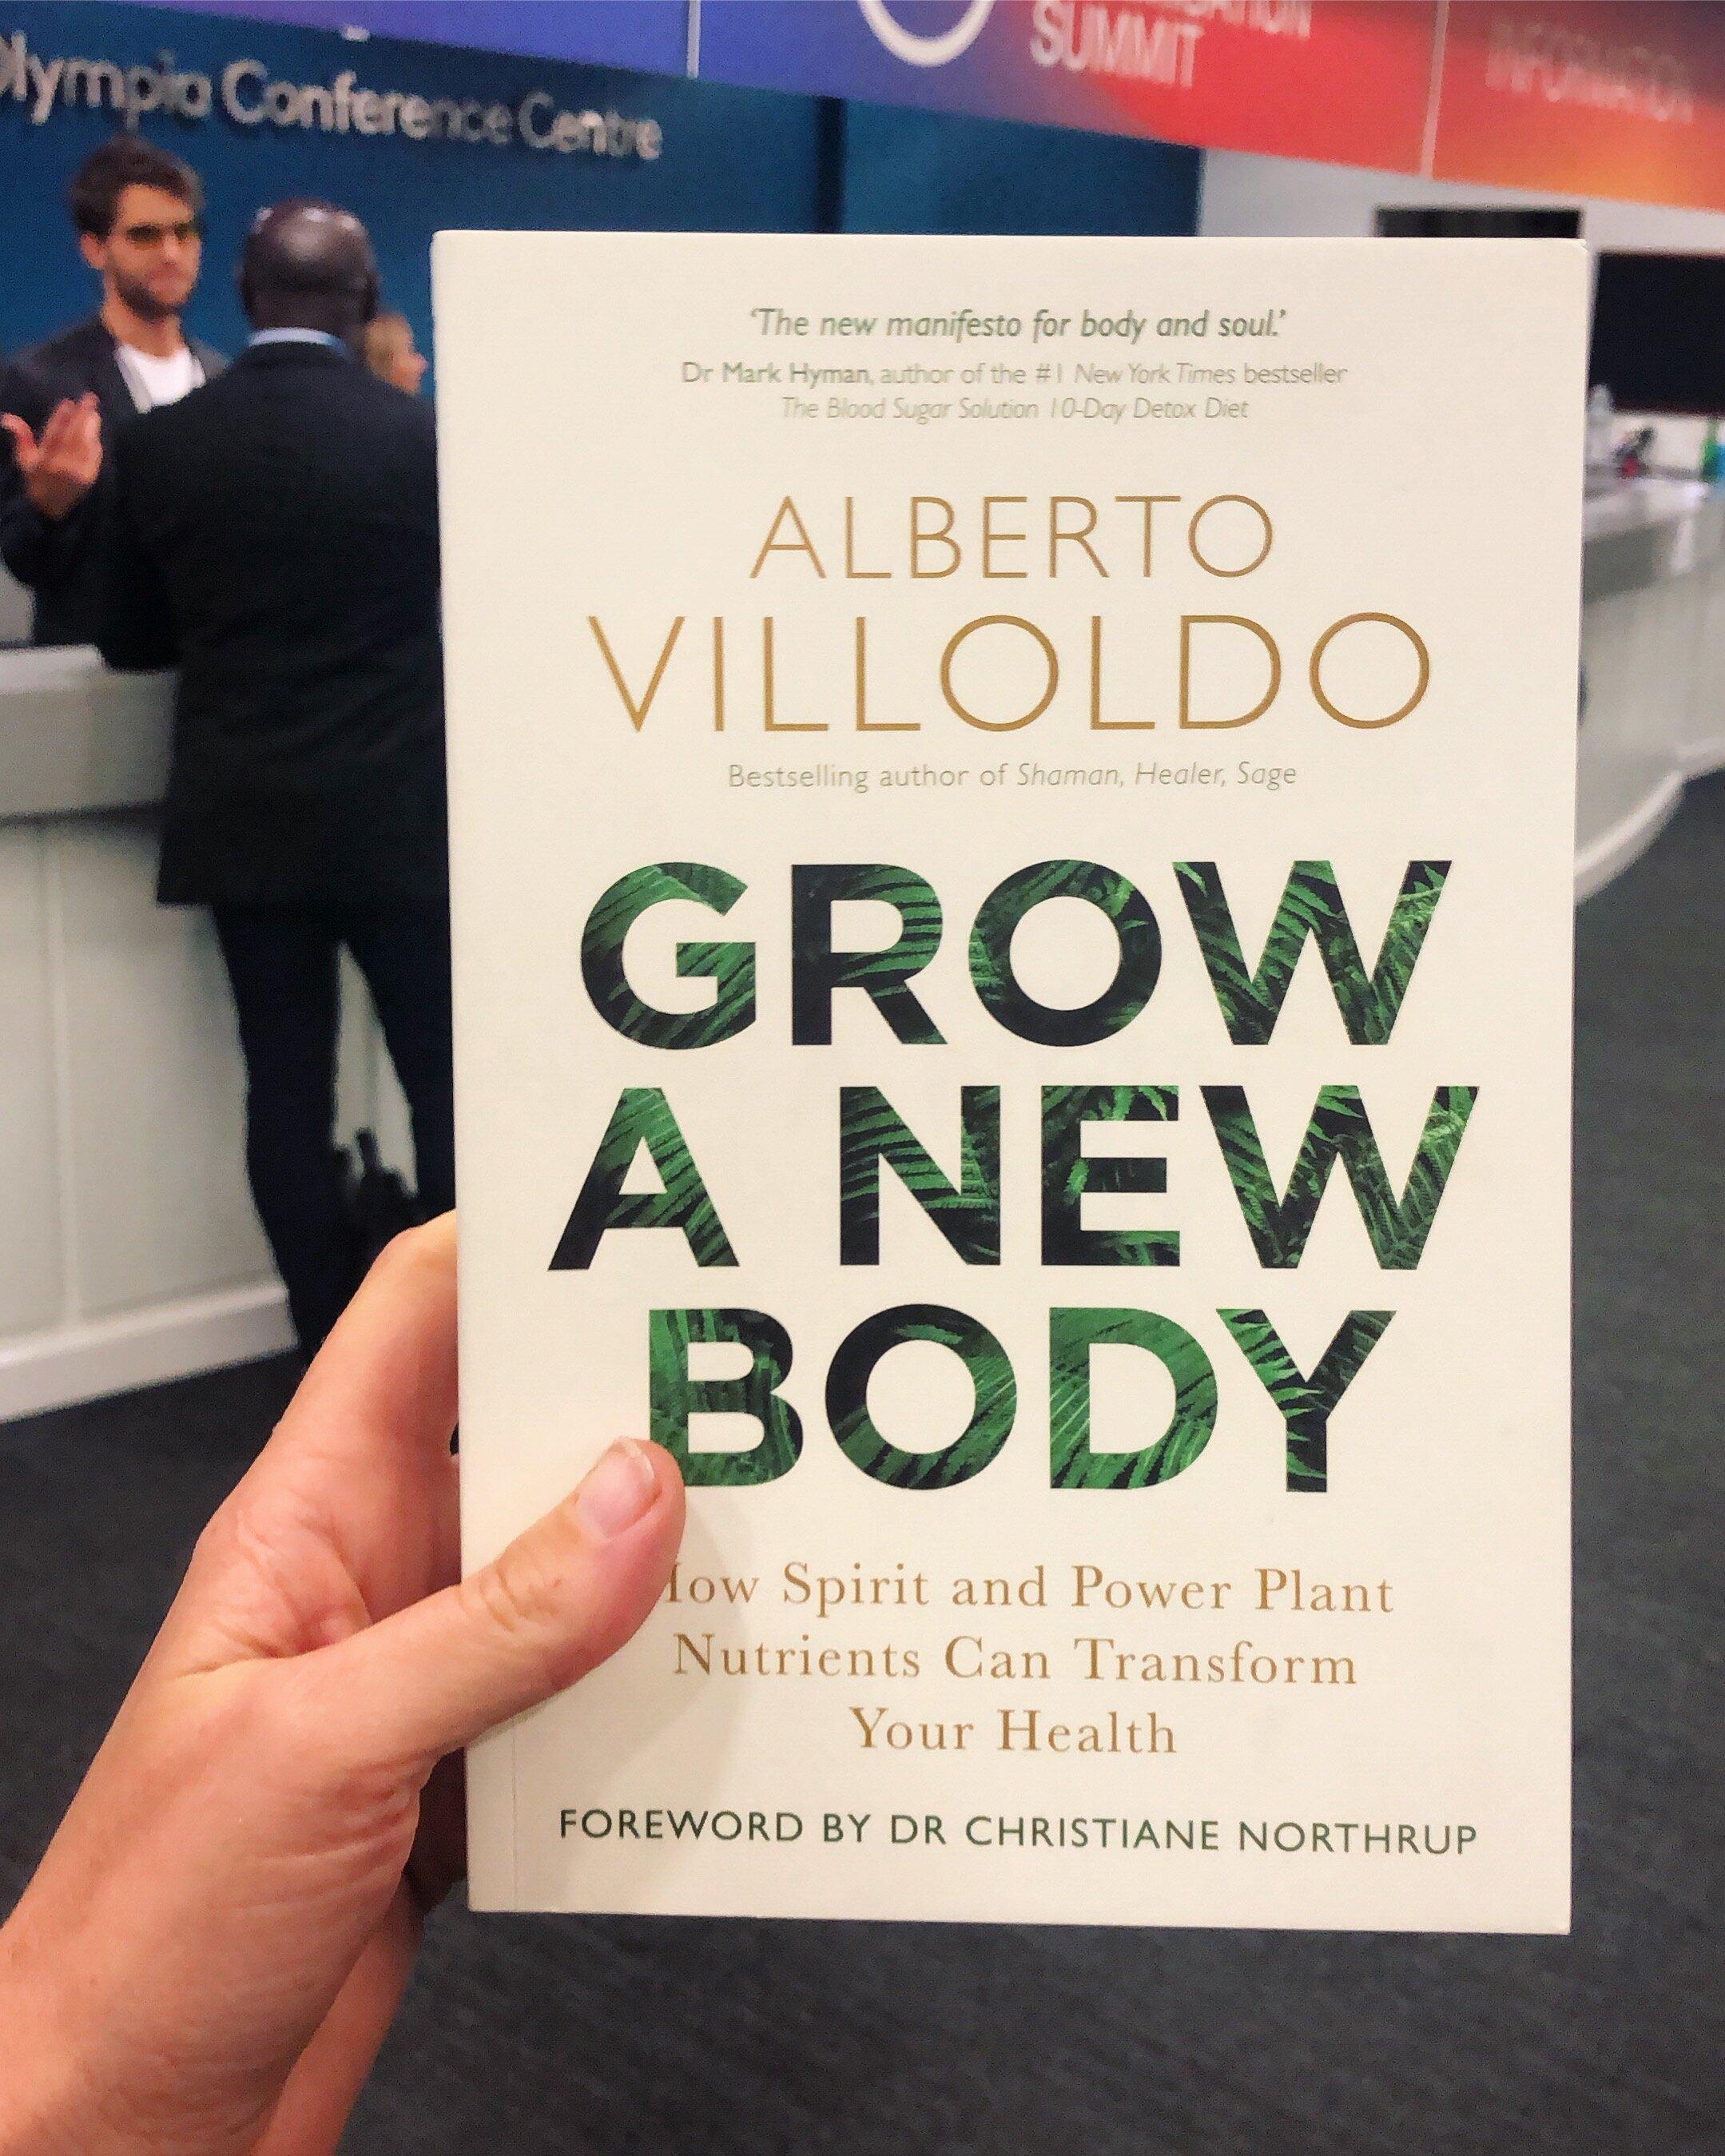 Shaman 1: Alberto Villoldo combines Spirit and super foods to help us transform our health